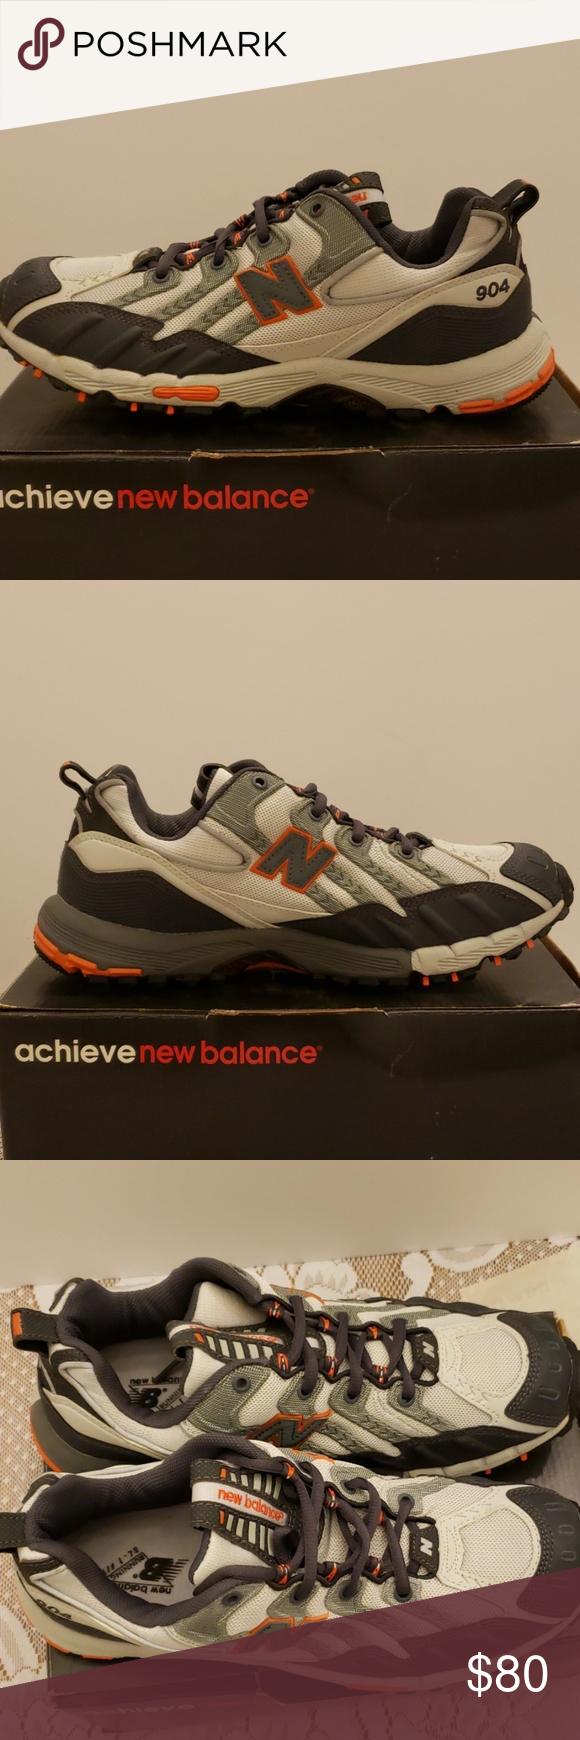 no pueden ver implícito Microbio  New Balance 904 Sneakers | Sneakers, Sneakers grey, New balance